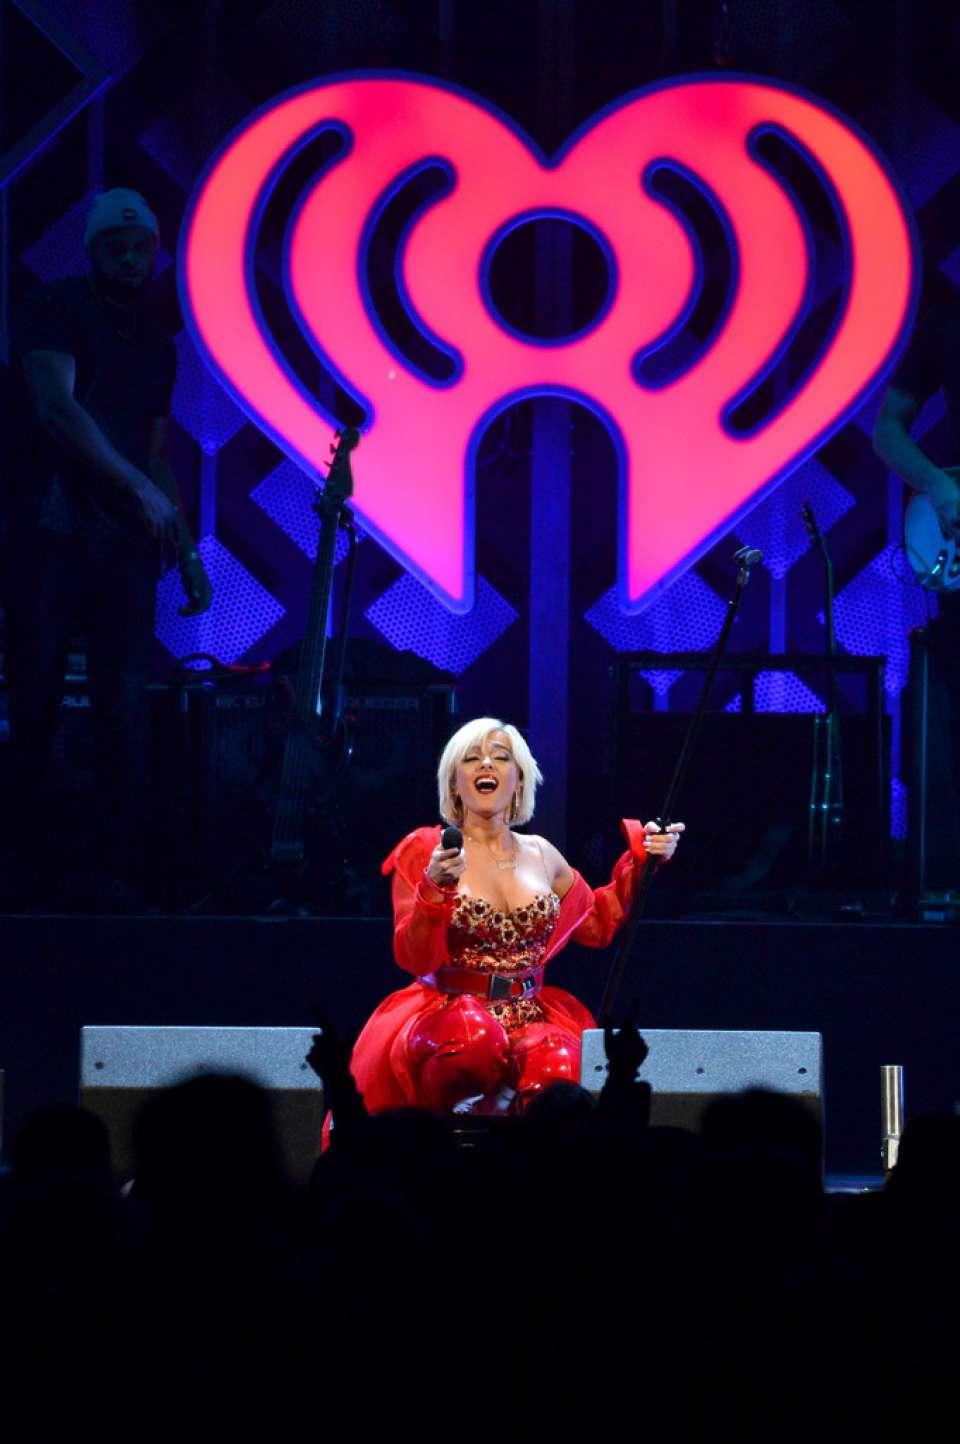 Bebe Rexha 2018 : Bebe Rexha: Performing at iHeart Radio Jingle Ball -05